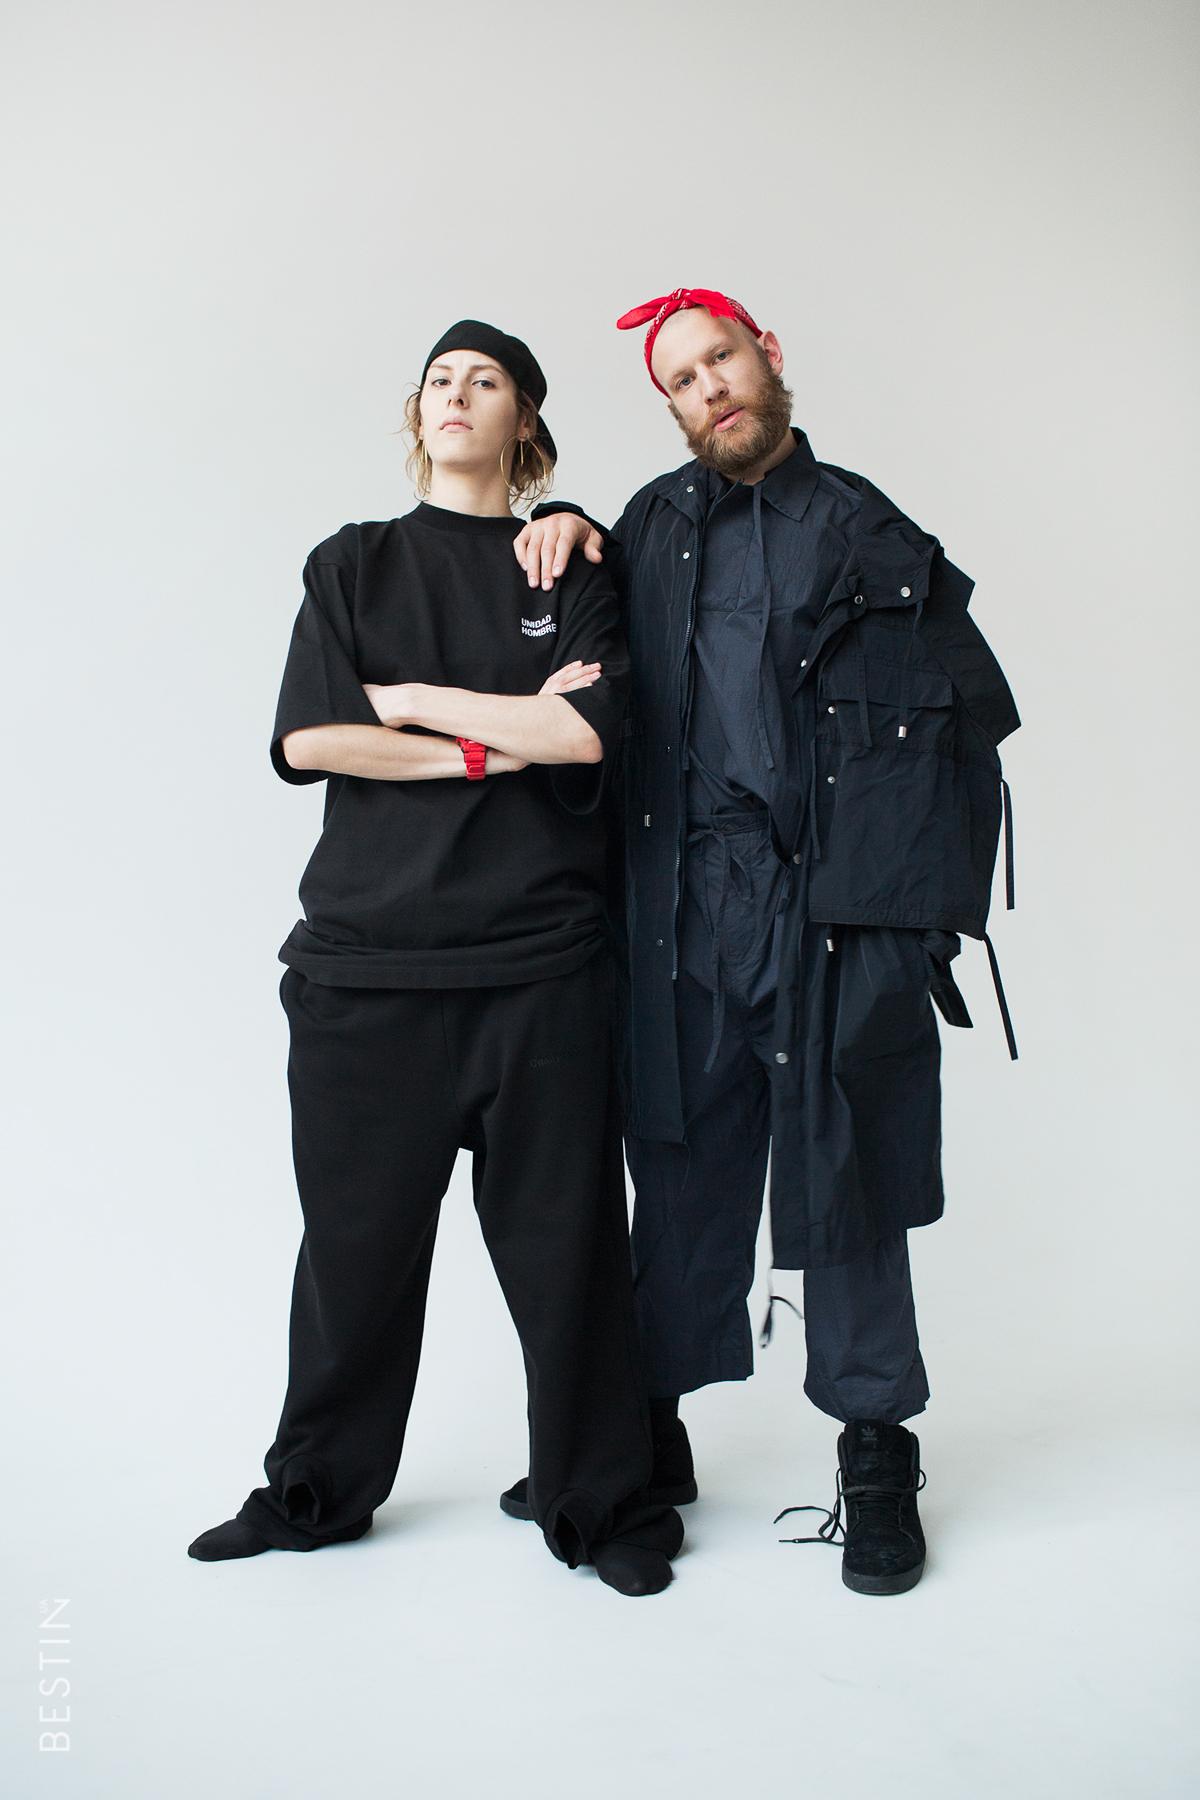 dorn-ira-interview-11